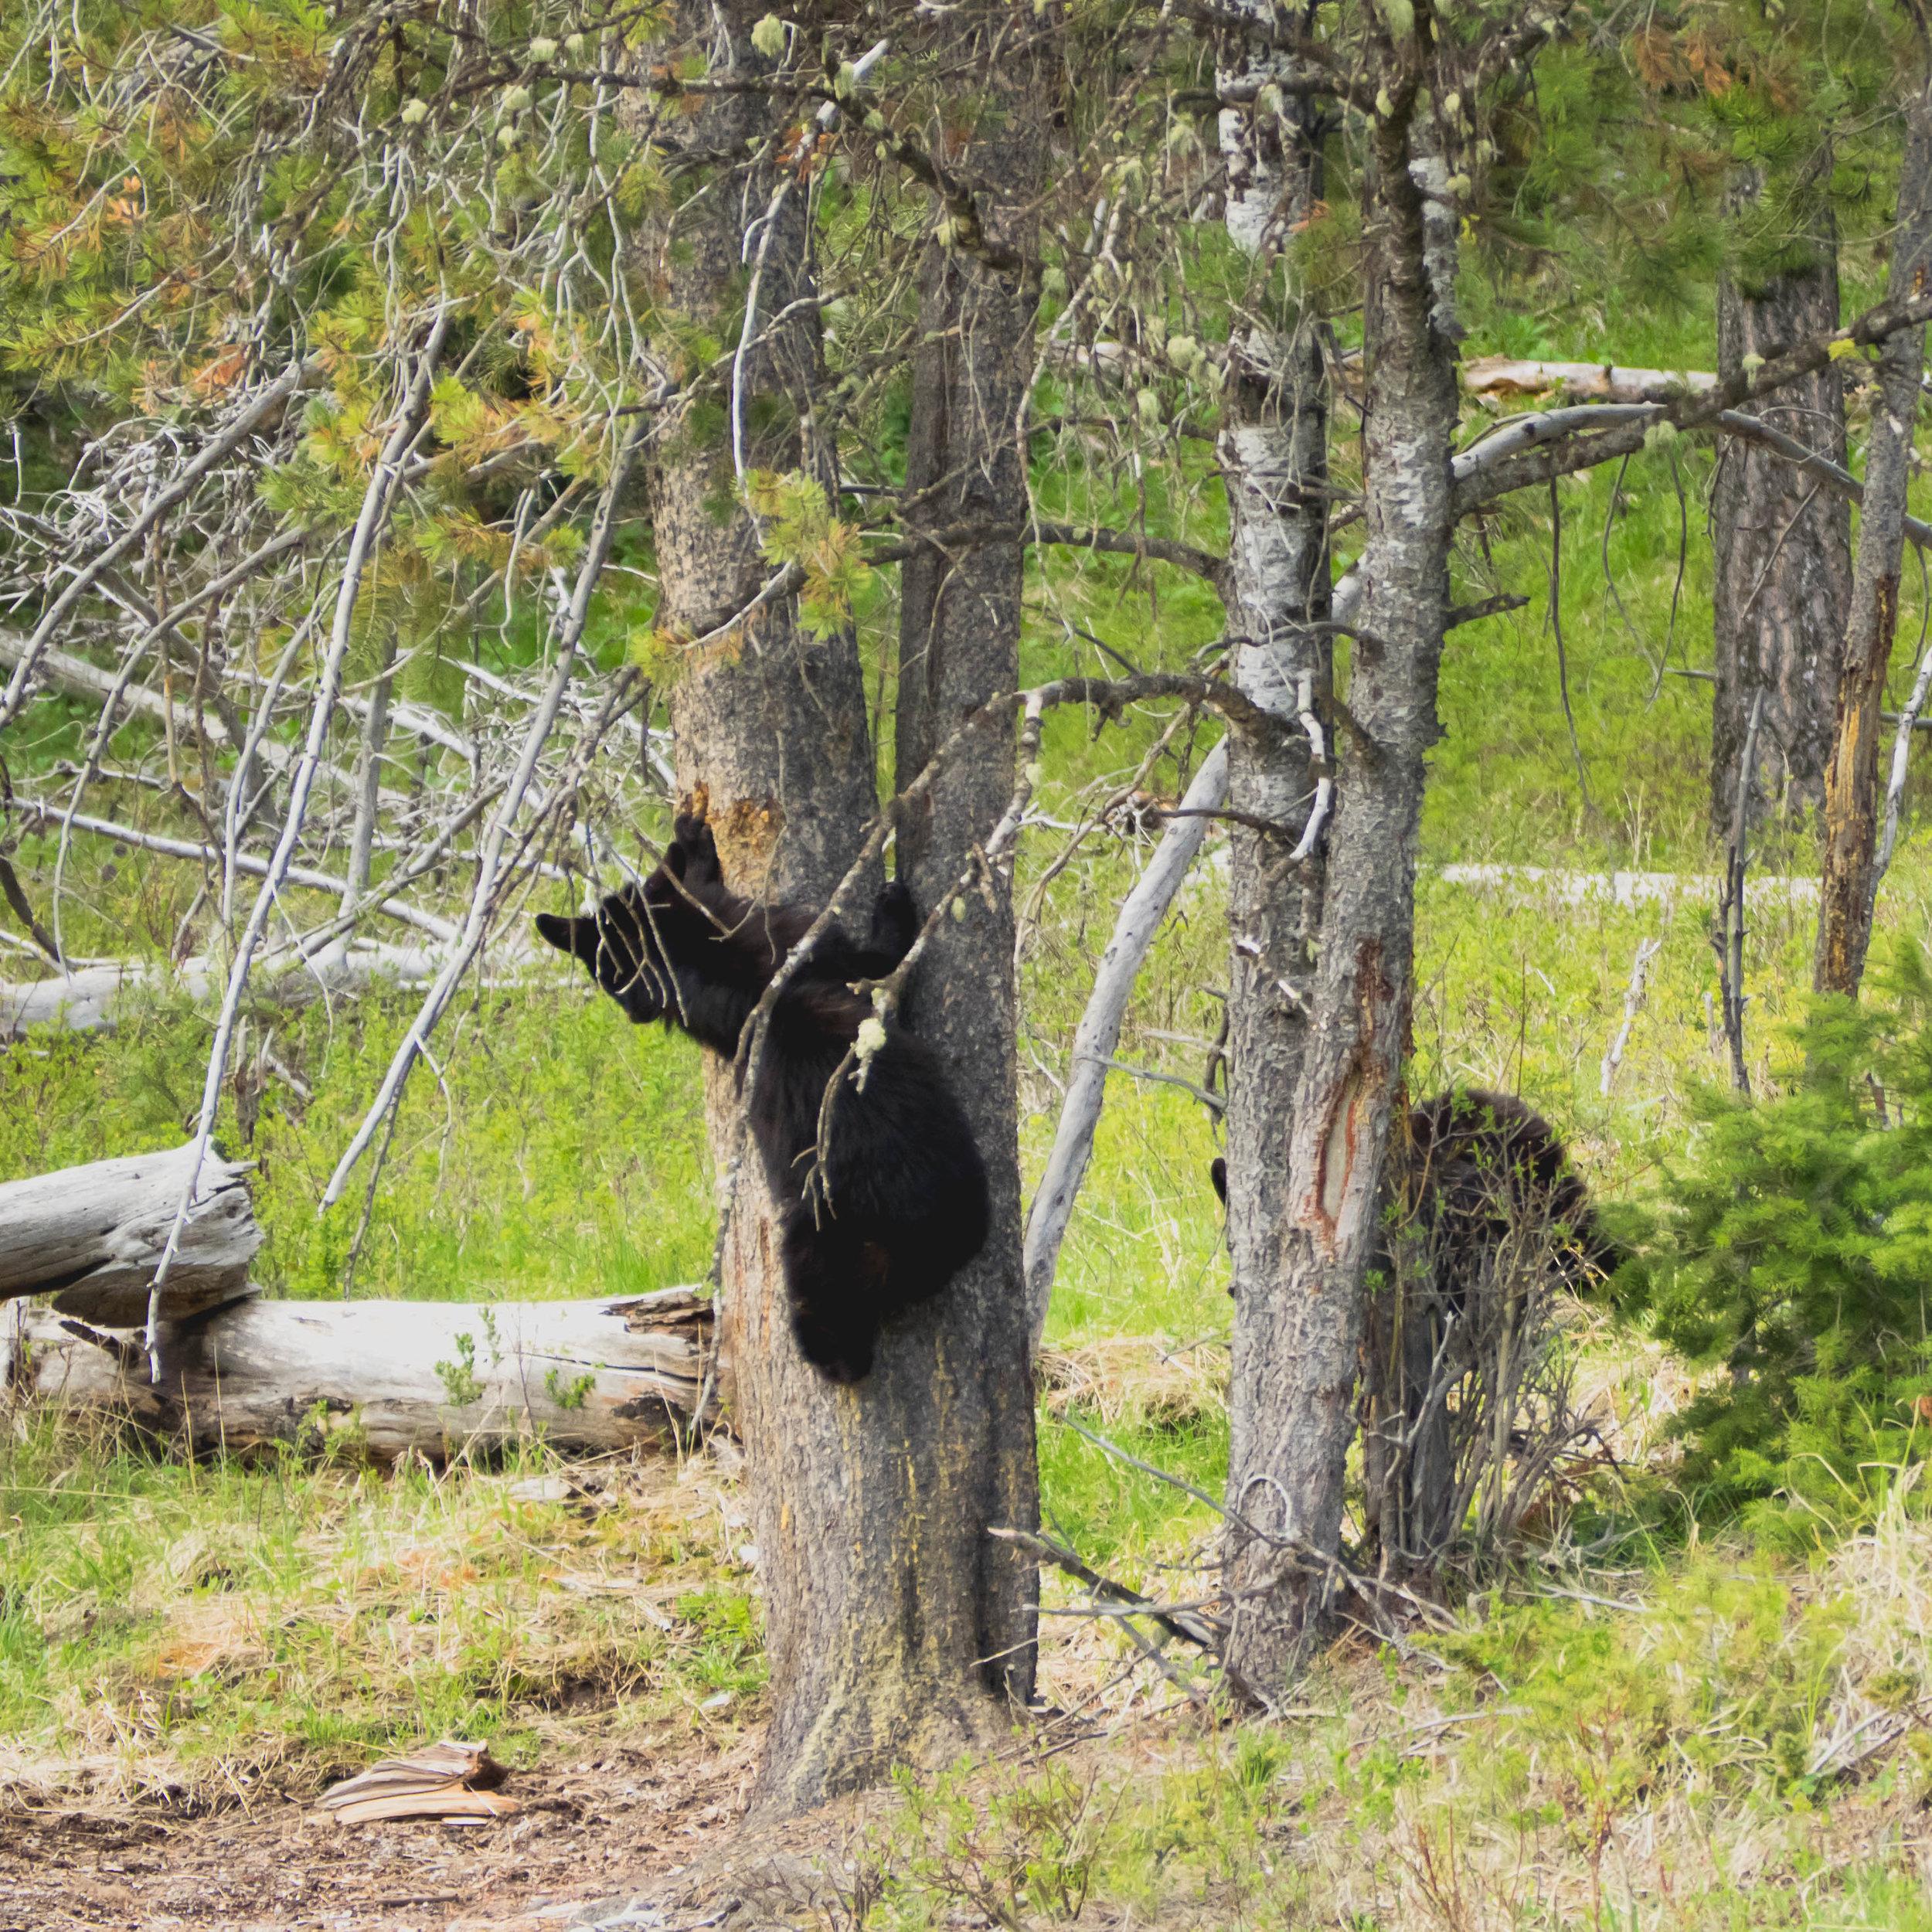 yellowstone-wildlife-safari-126.jpg